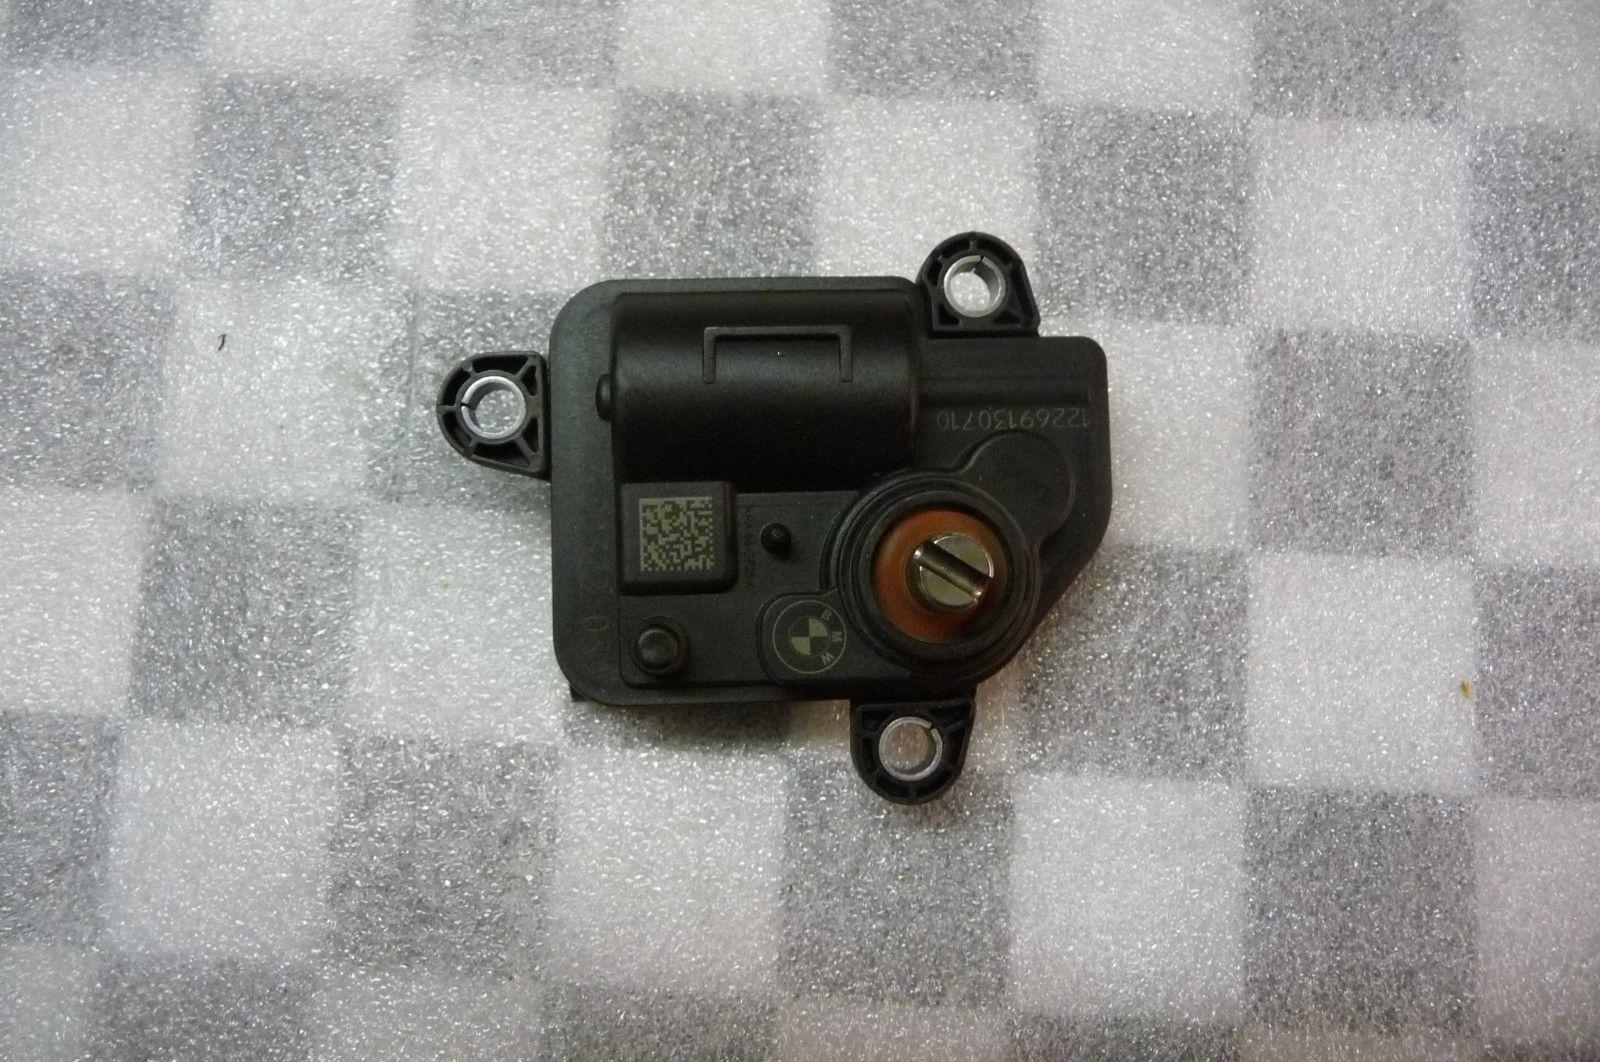 BMW 2 3 4 Series i8 M235iX X5 Exhaust Flap Actuator Drive 18307620322 OEM OE